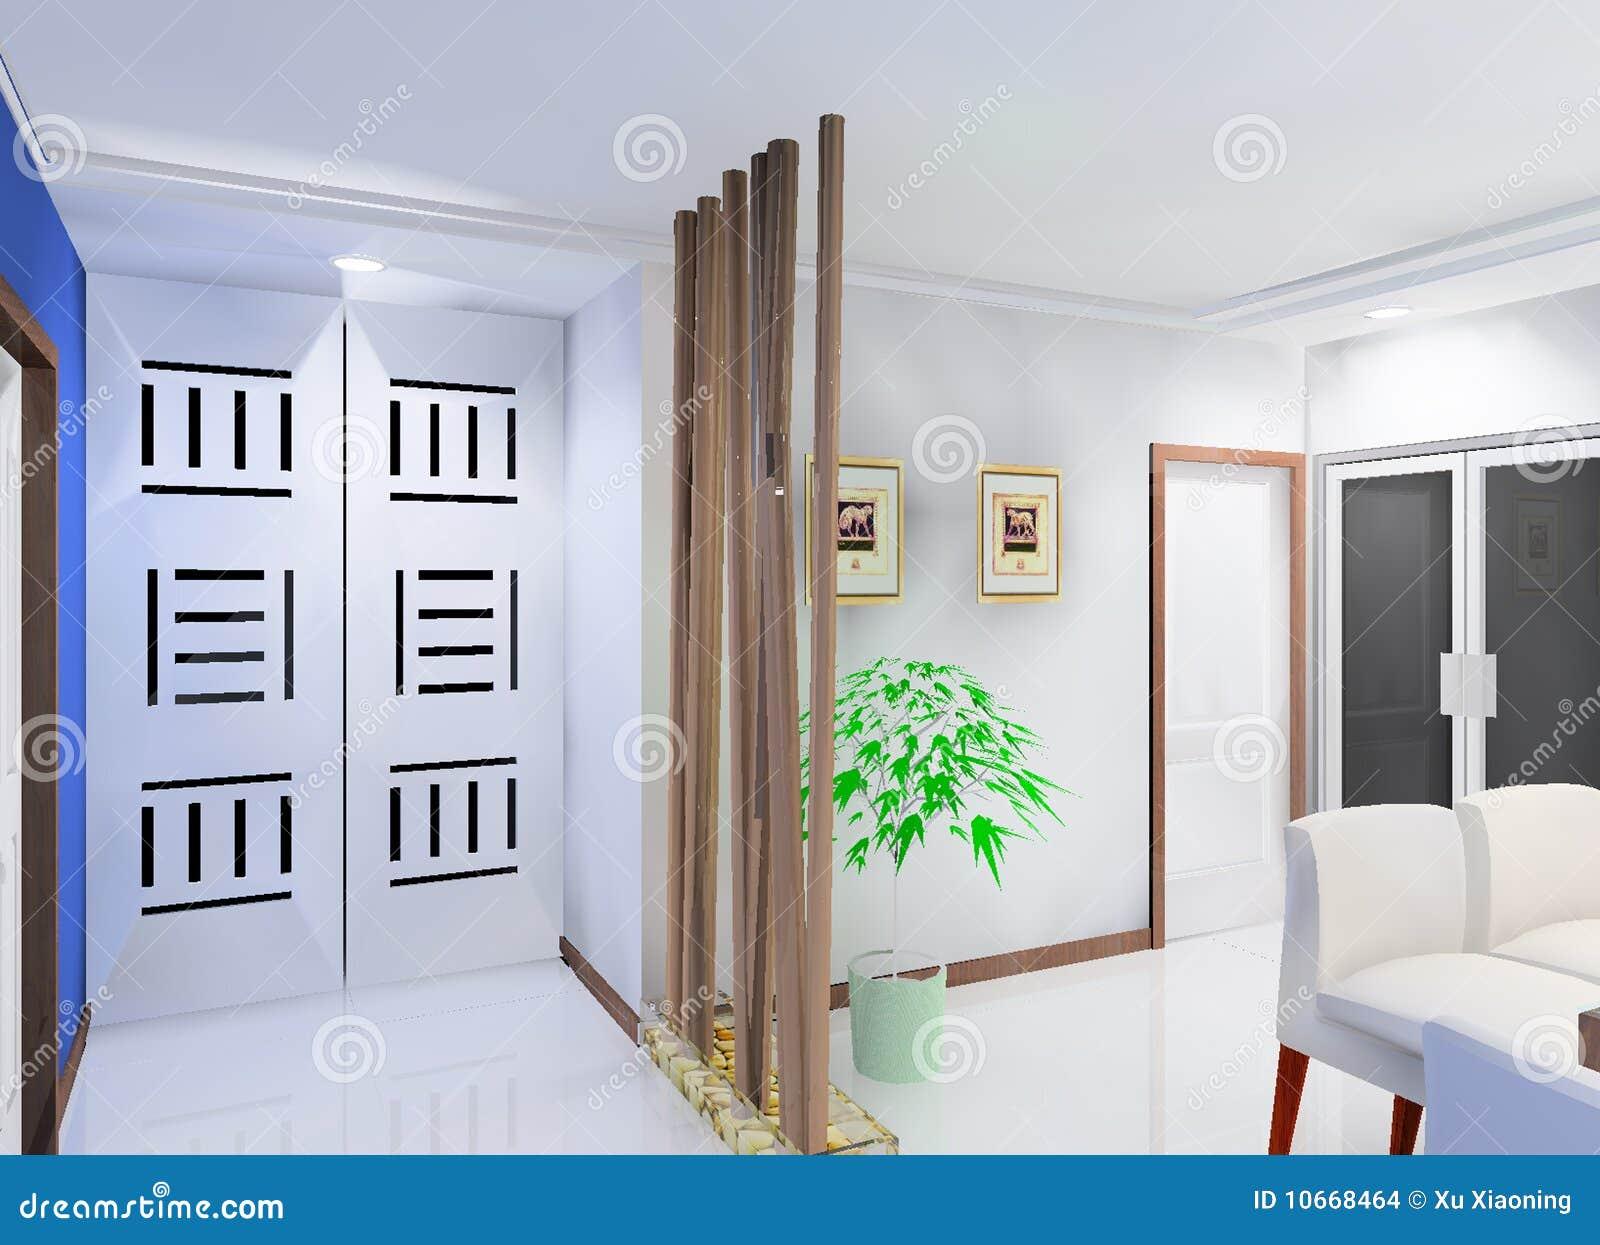 Corridor Design: Corridor Design Stock Illustration. Illustration Of Room